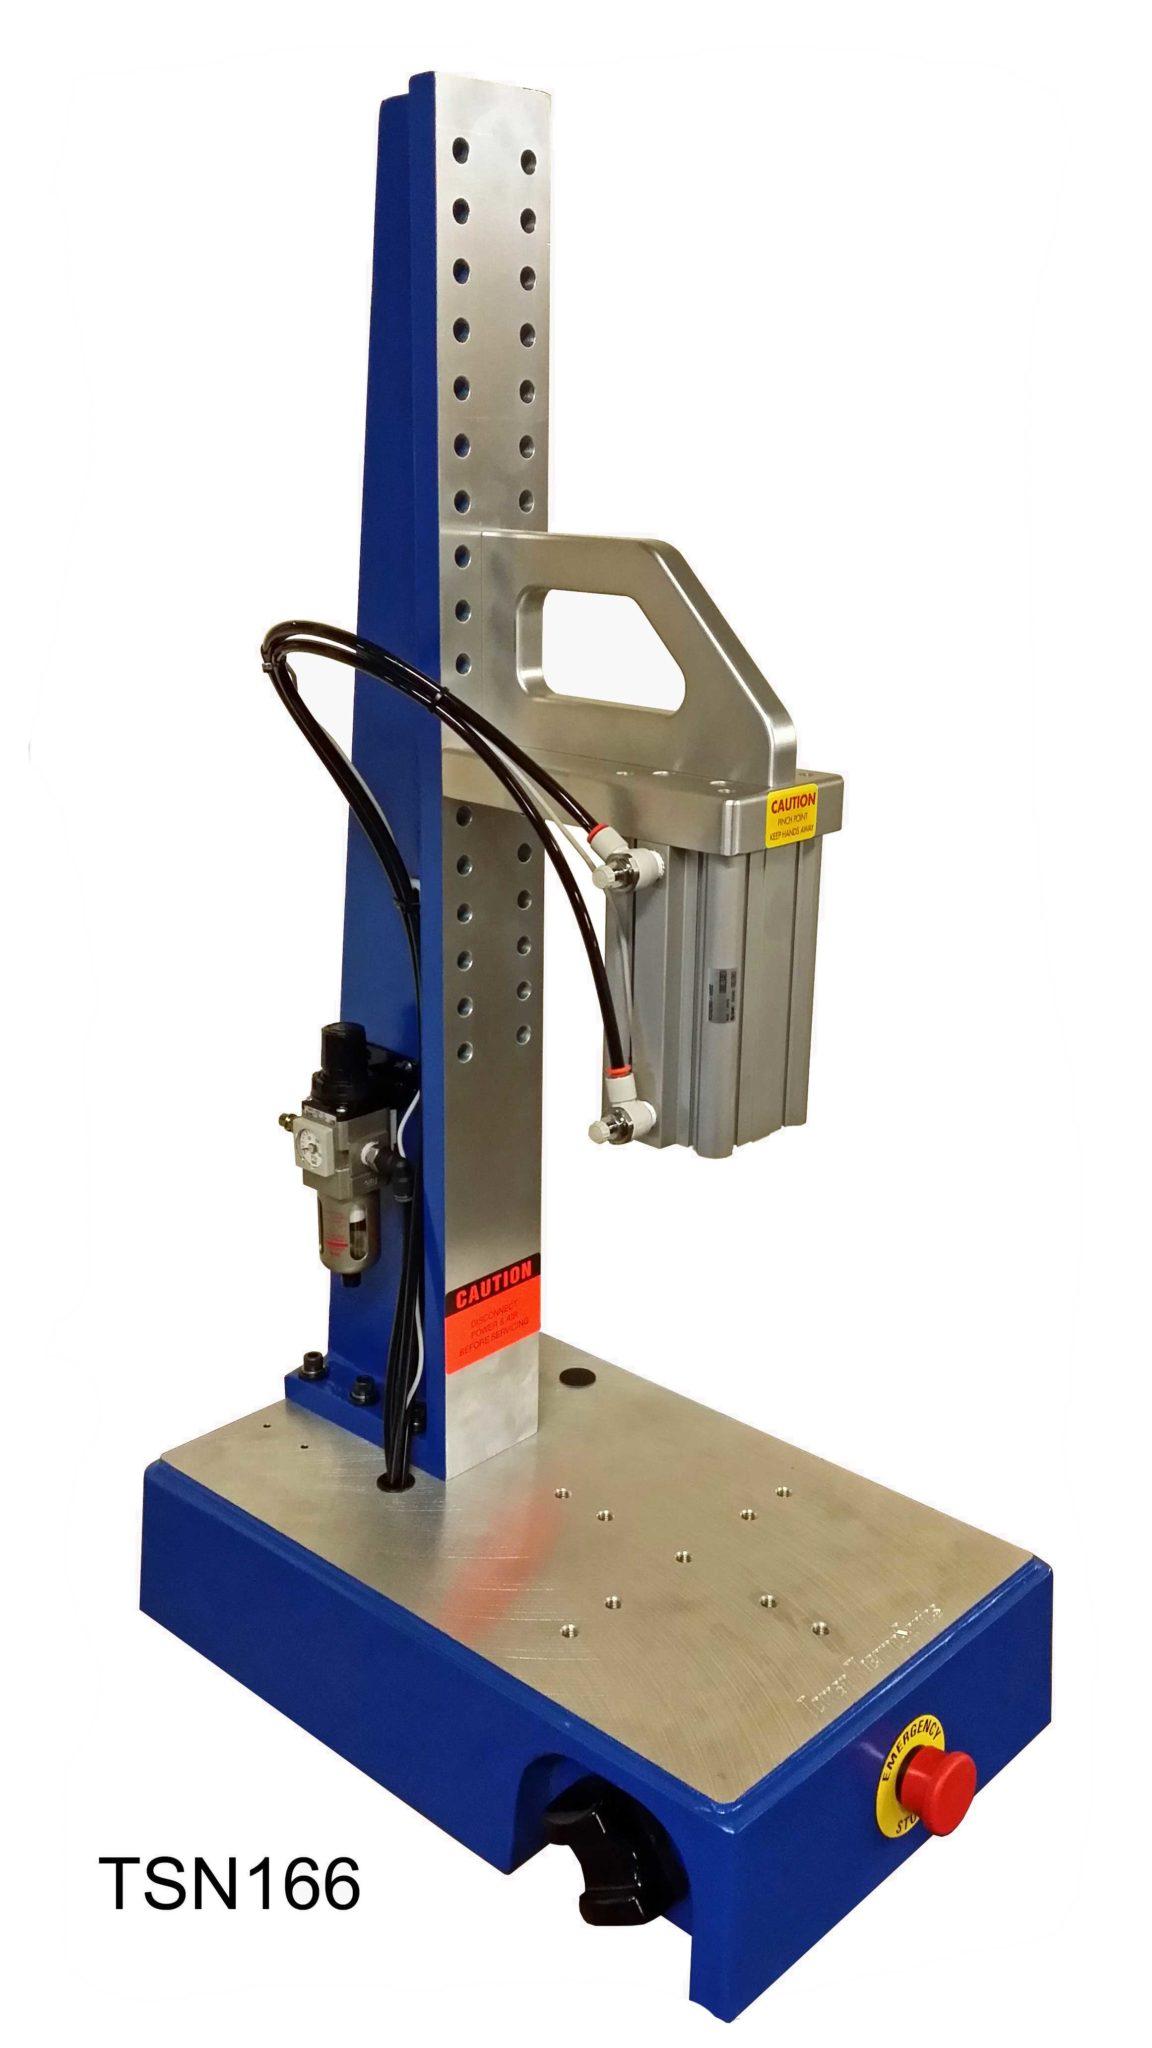 pneumatic presses, air press, toman thermosonics technical info